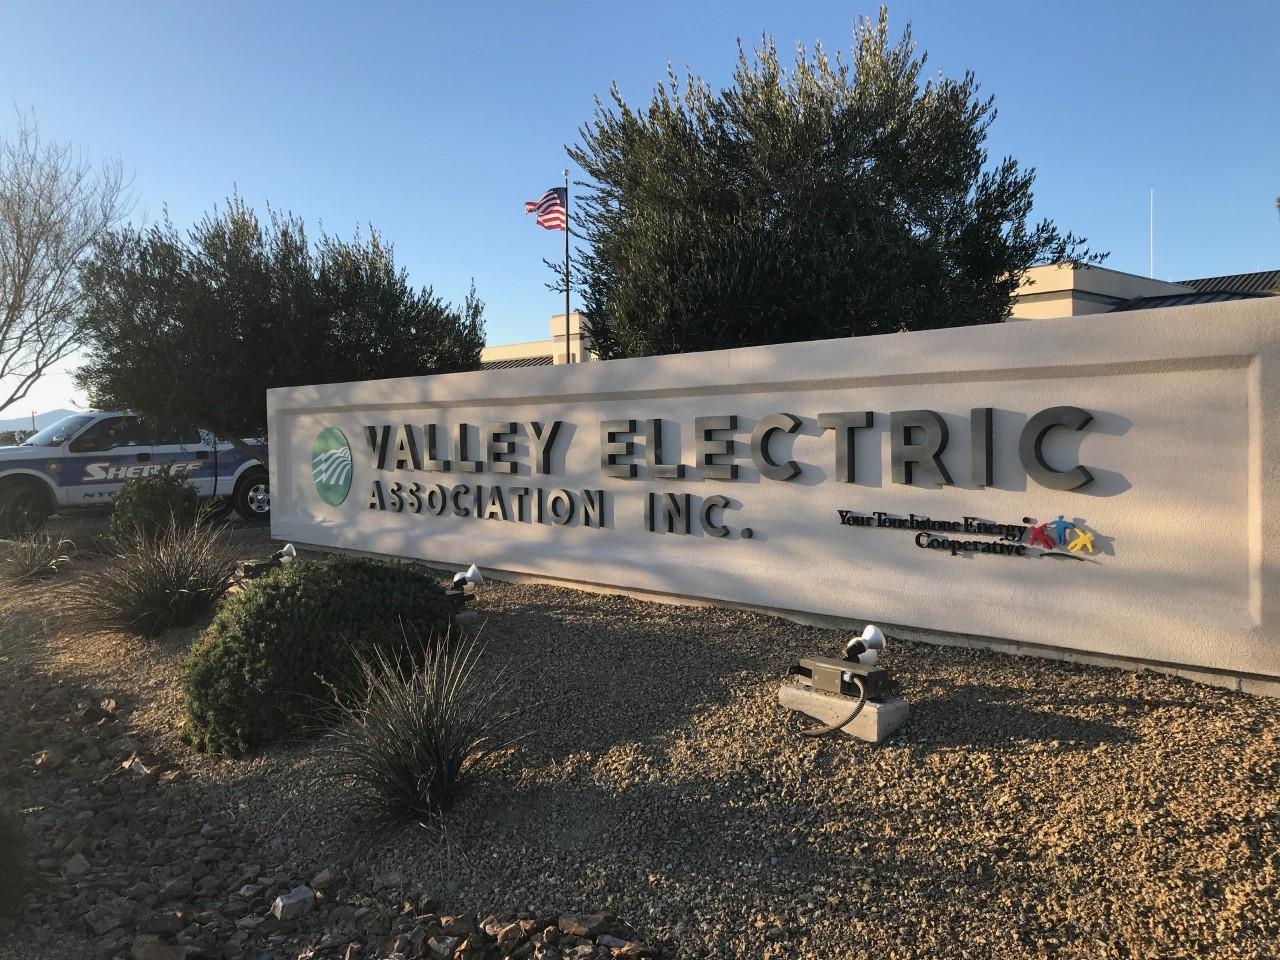 Valley_Electric_Association_1_1550906654663.jpg